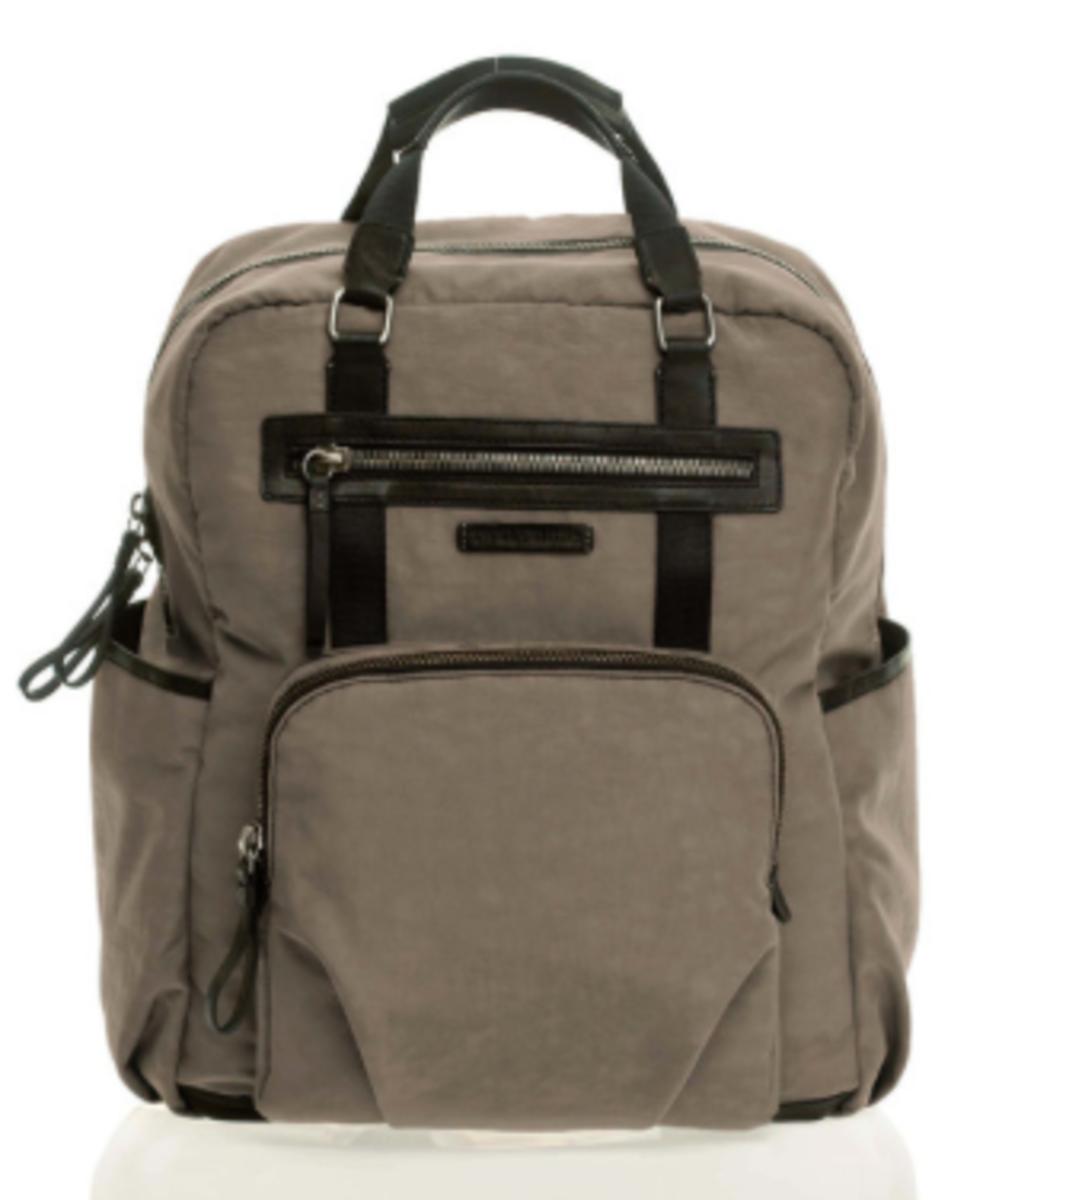 Unisex Courage Backpack from TWELVELittle